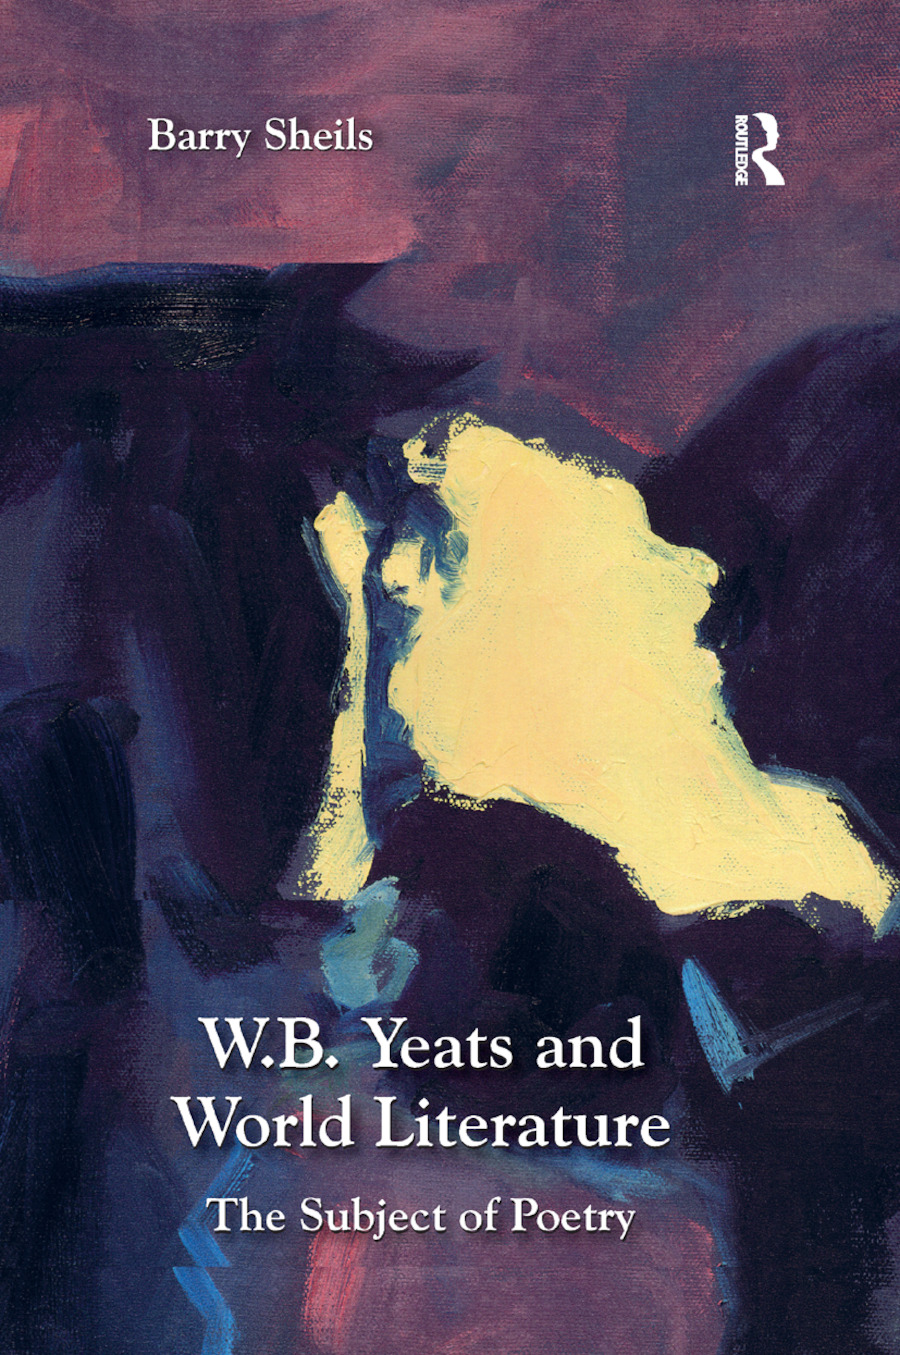 W.B. Yeats and World Literature